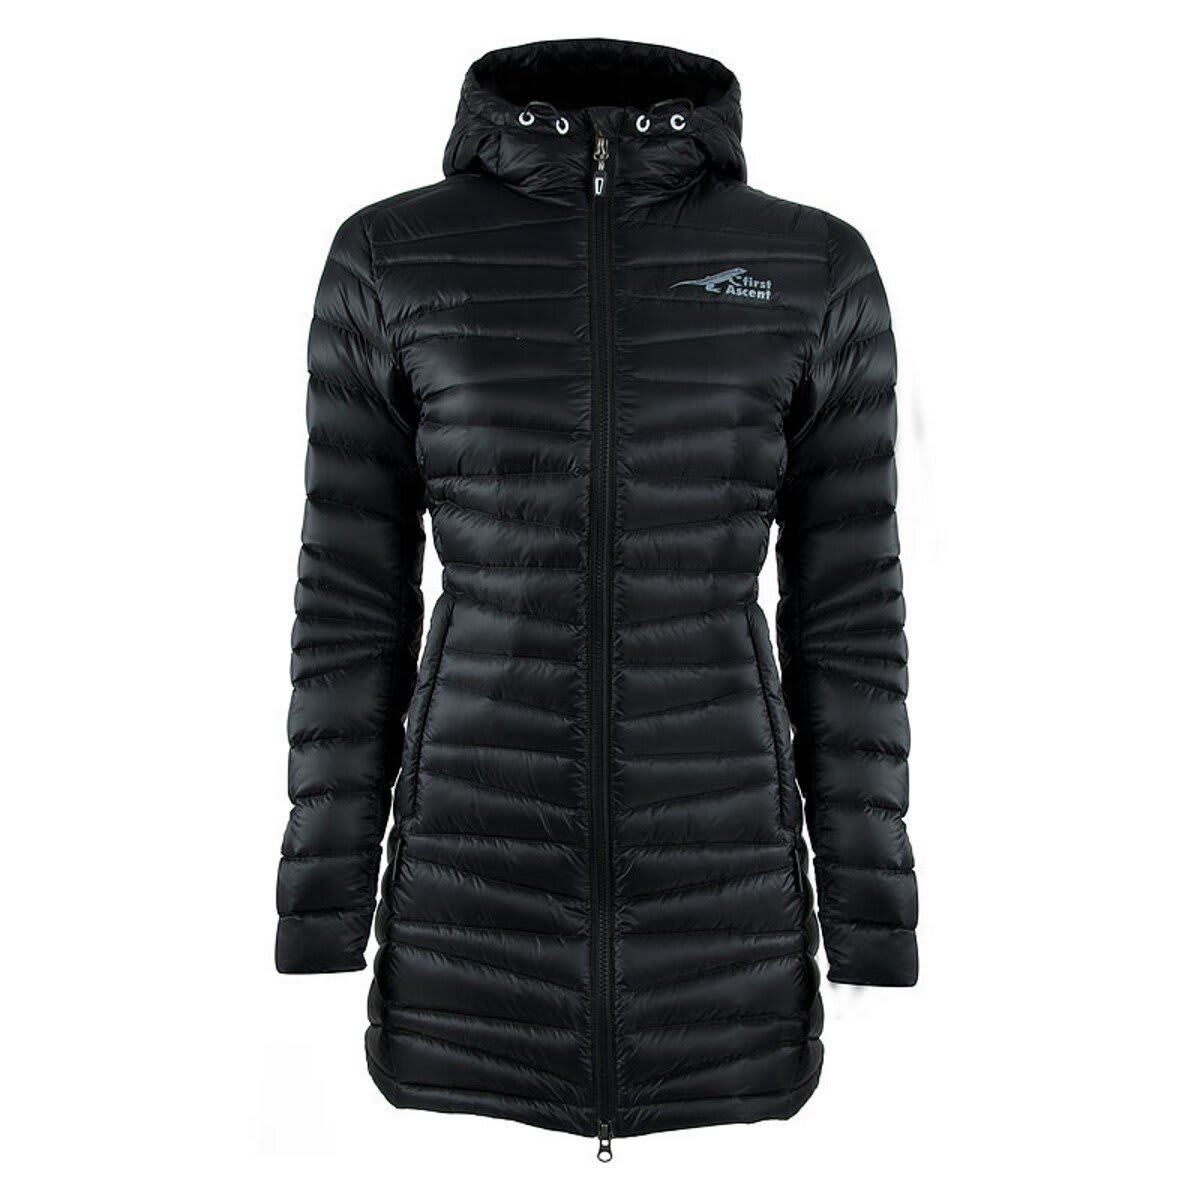 First Ascent Women's Arctic Down Parka Jacket